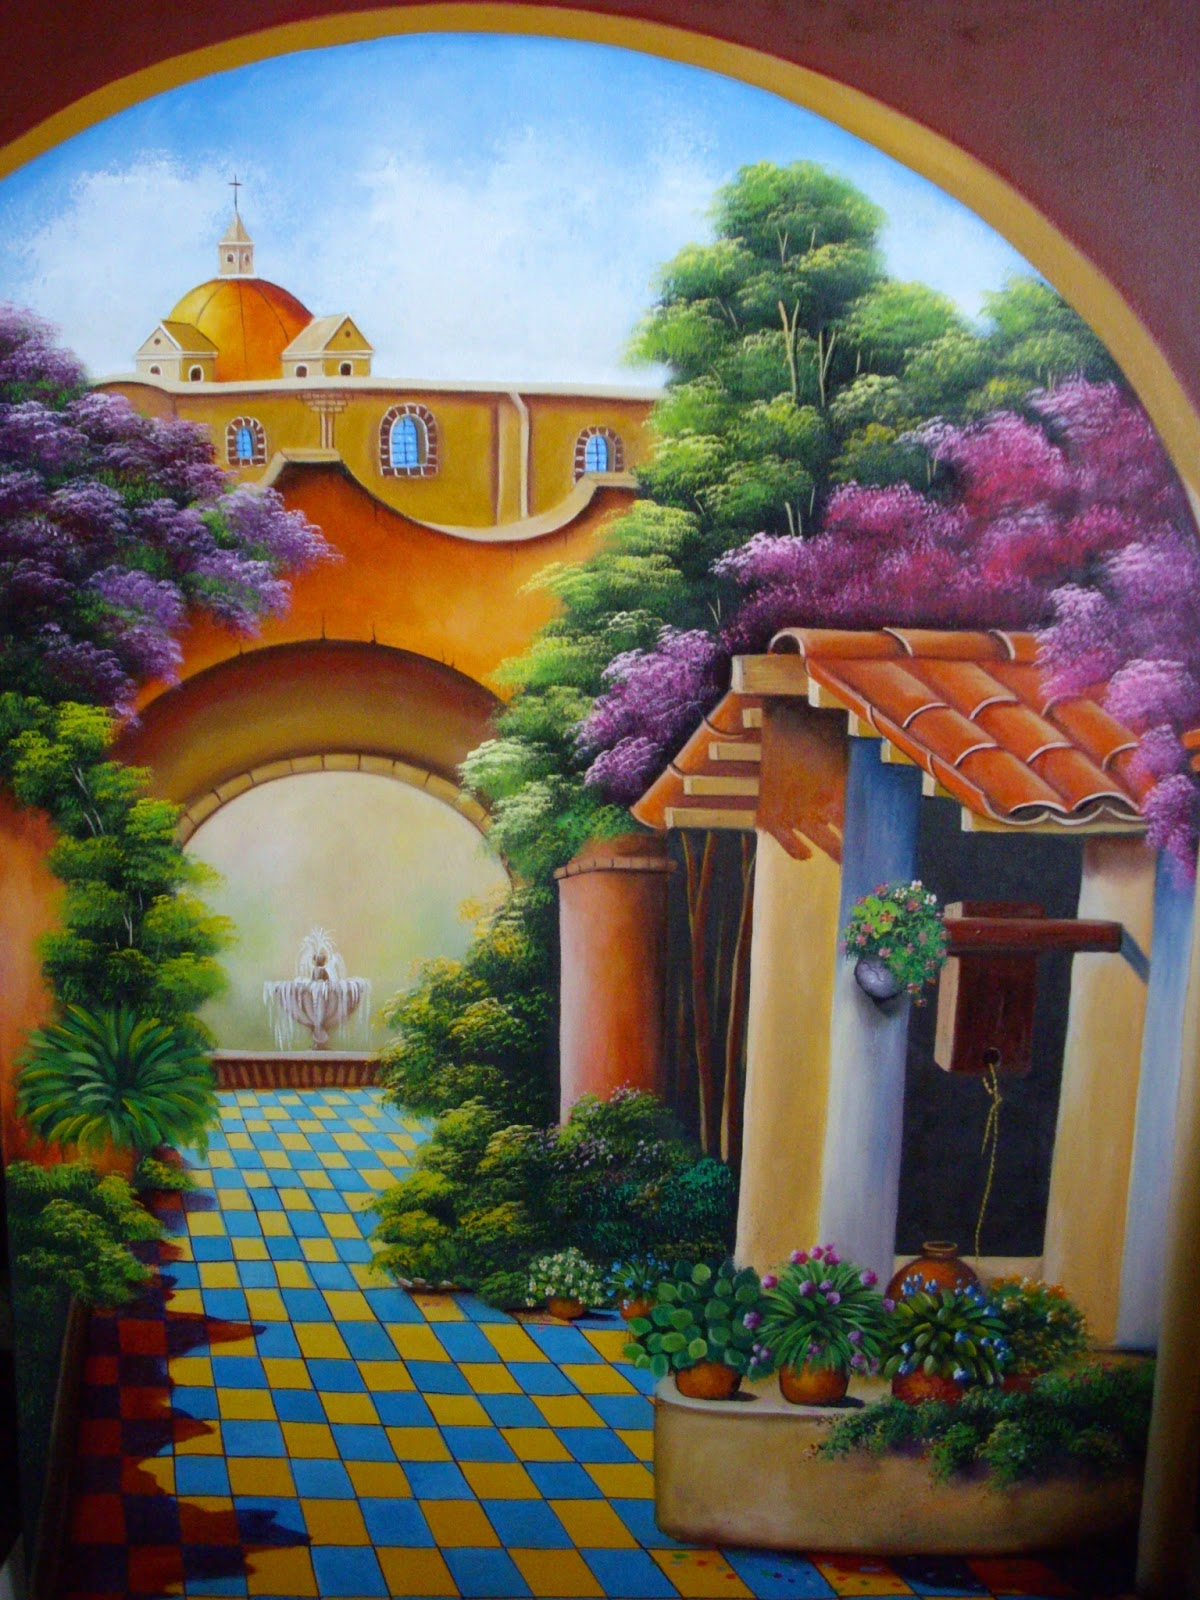 Pintura moderna y fotograf a art stica cuadros de arte - Como hacer cuadros faciles en casa ...